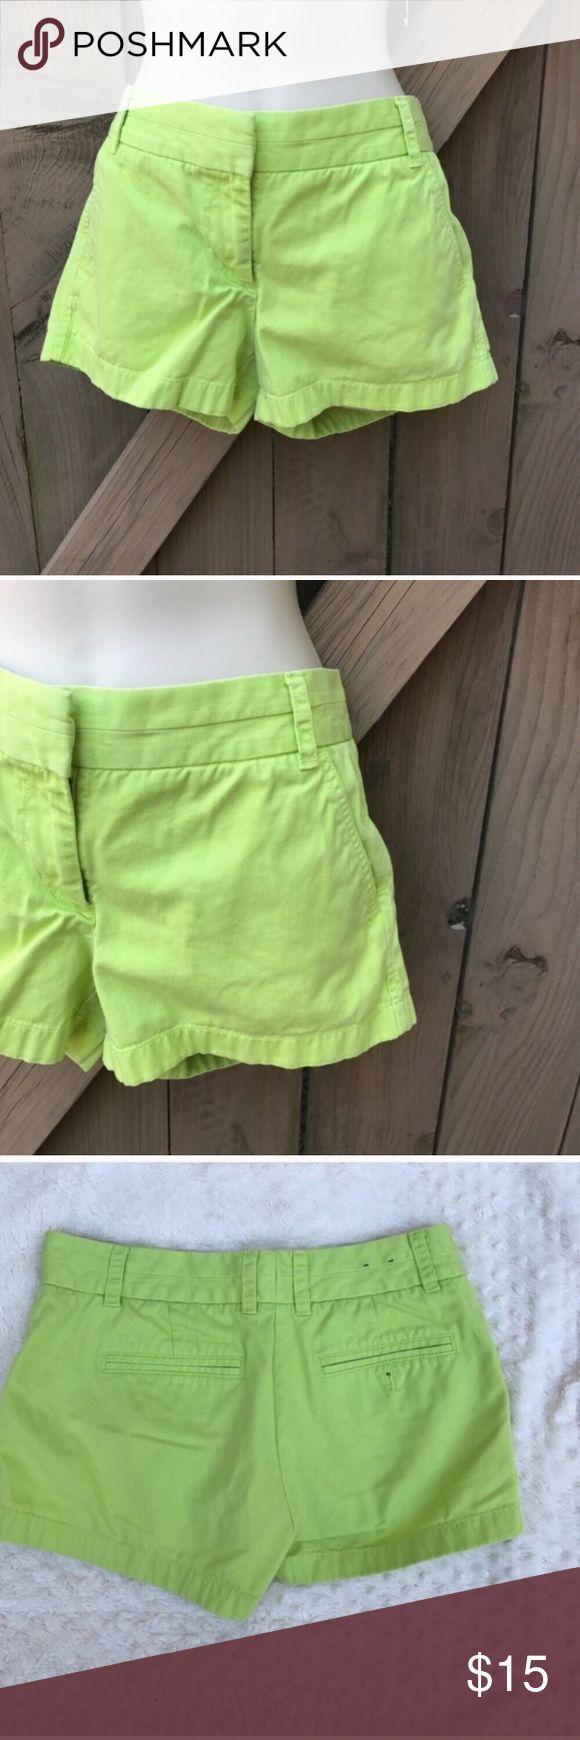 J. Crew chino shorts neon green size 4 Size 4 neon green J. Crew chino shorts: BIN 1 J. Crew Shorts